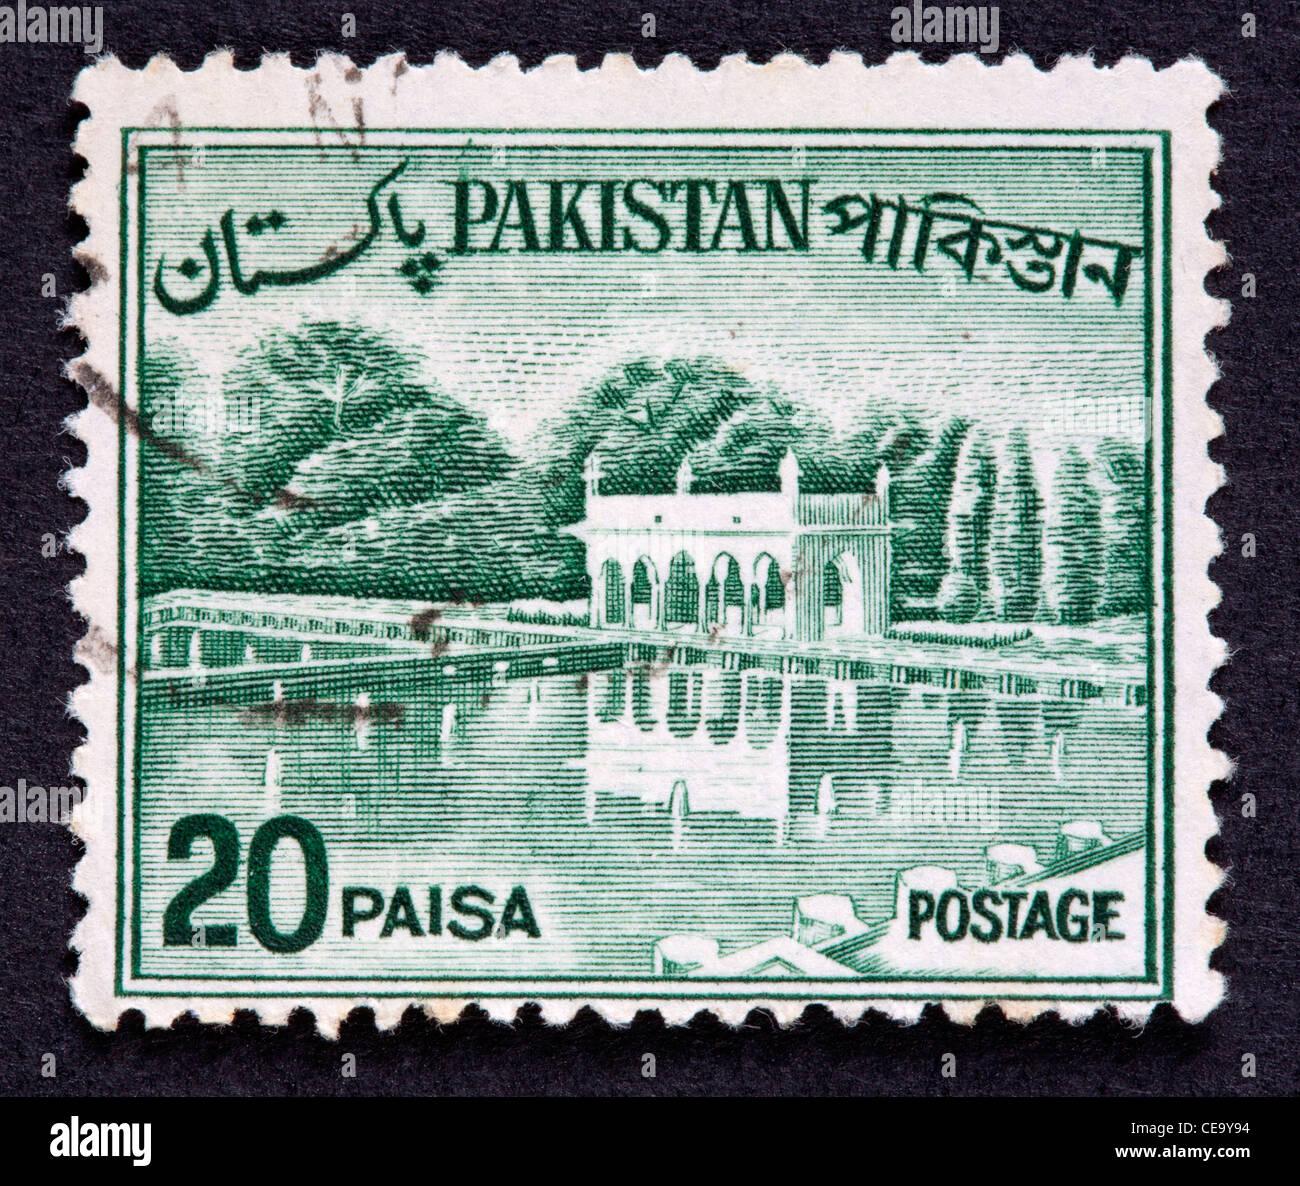 Pakistani postage stamp - Stock Image